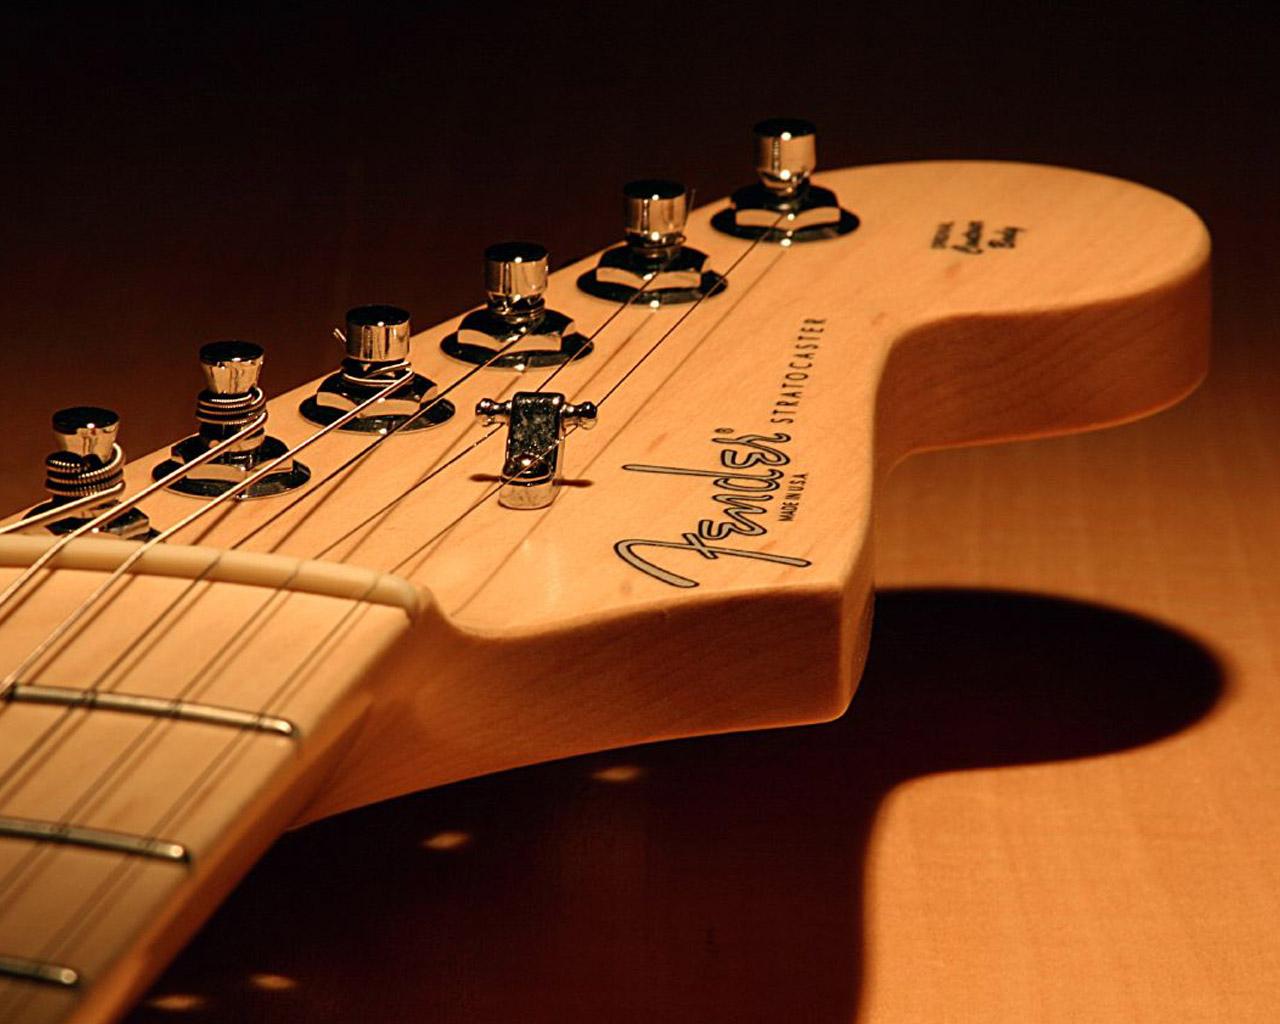 Guitar Wallpaper   Fender Stratocaster Headstock   1280x1024 Great 1280x1024